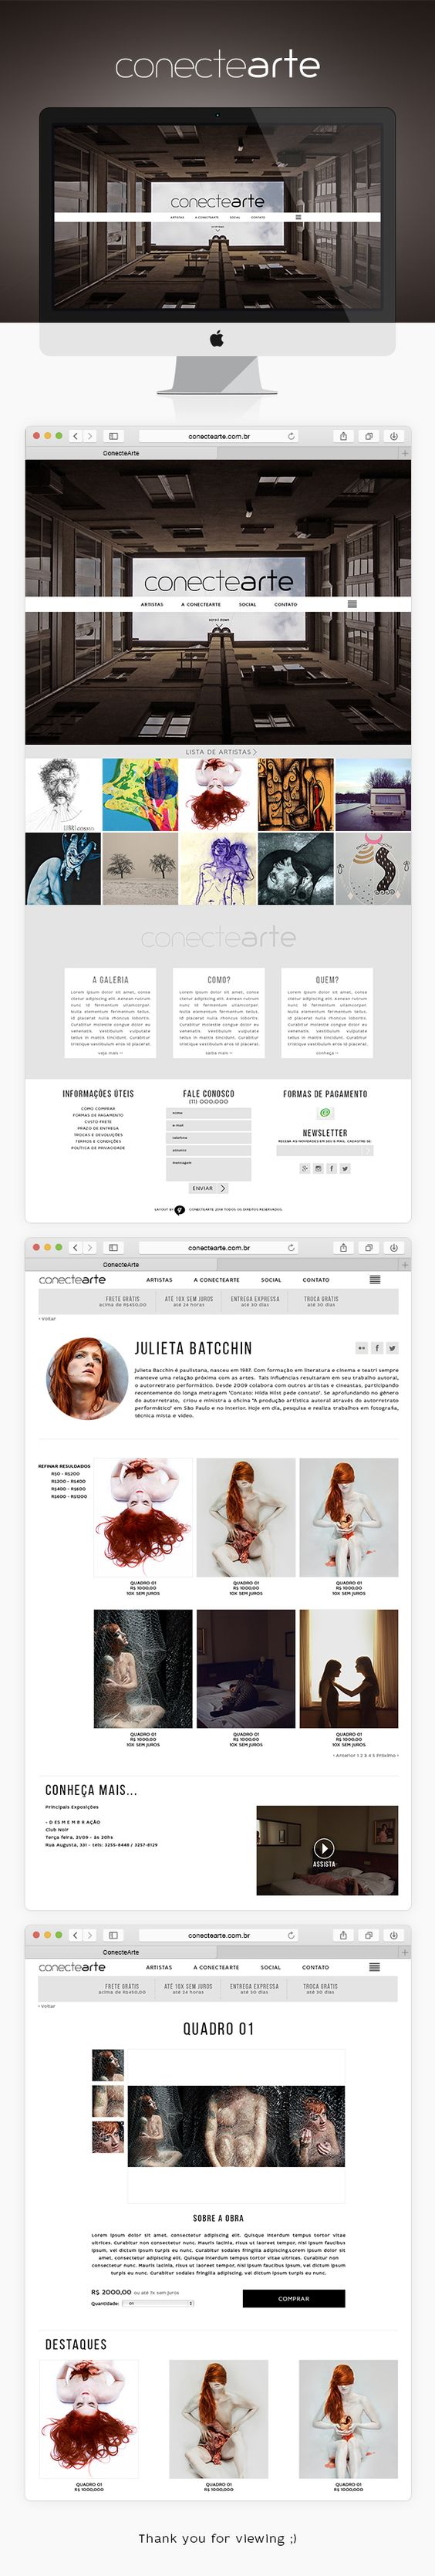 ConecteArte - Galeria de arte online on Behance